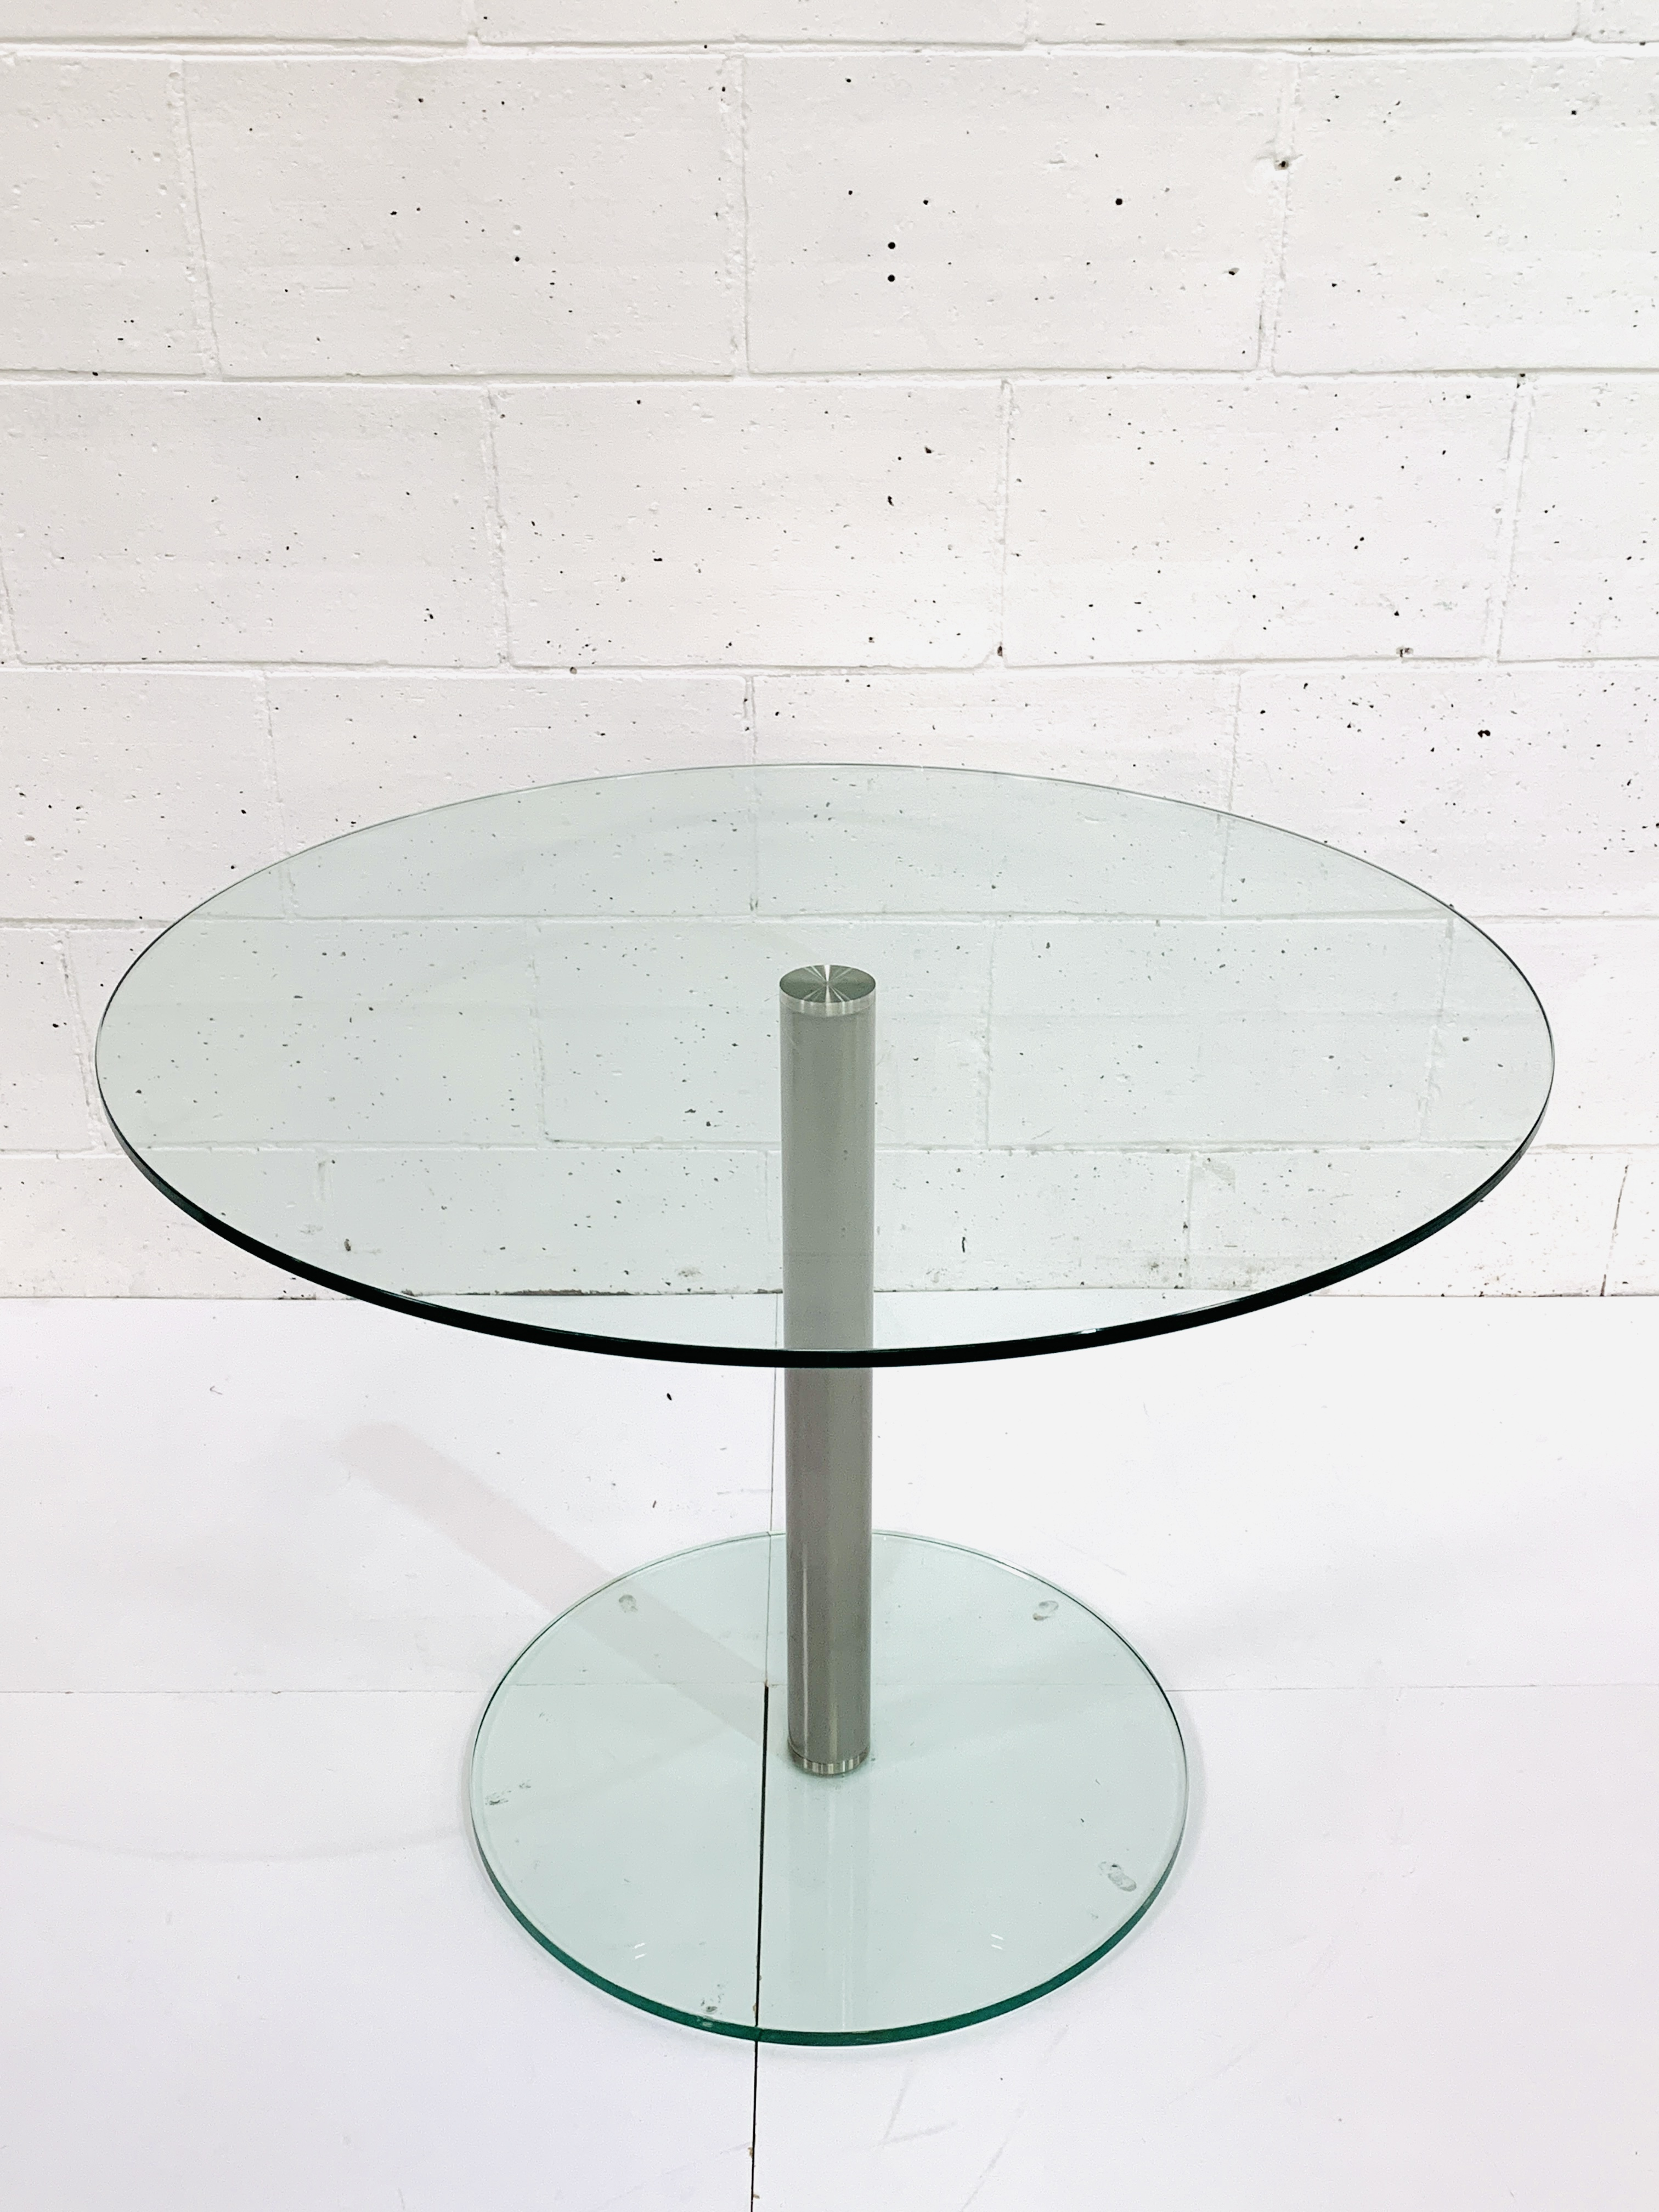 Circular glass top table - Image 2 of 3